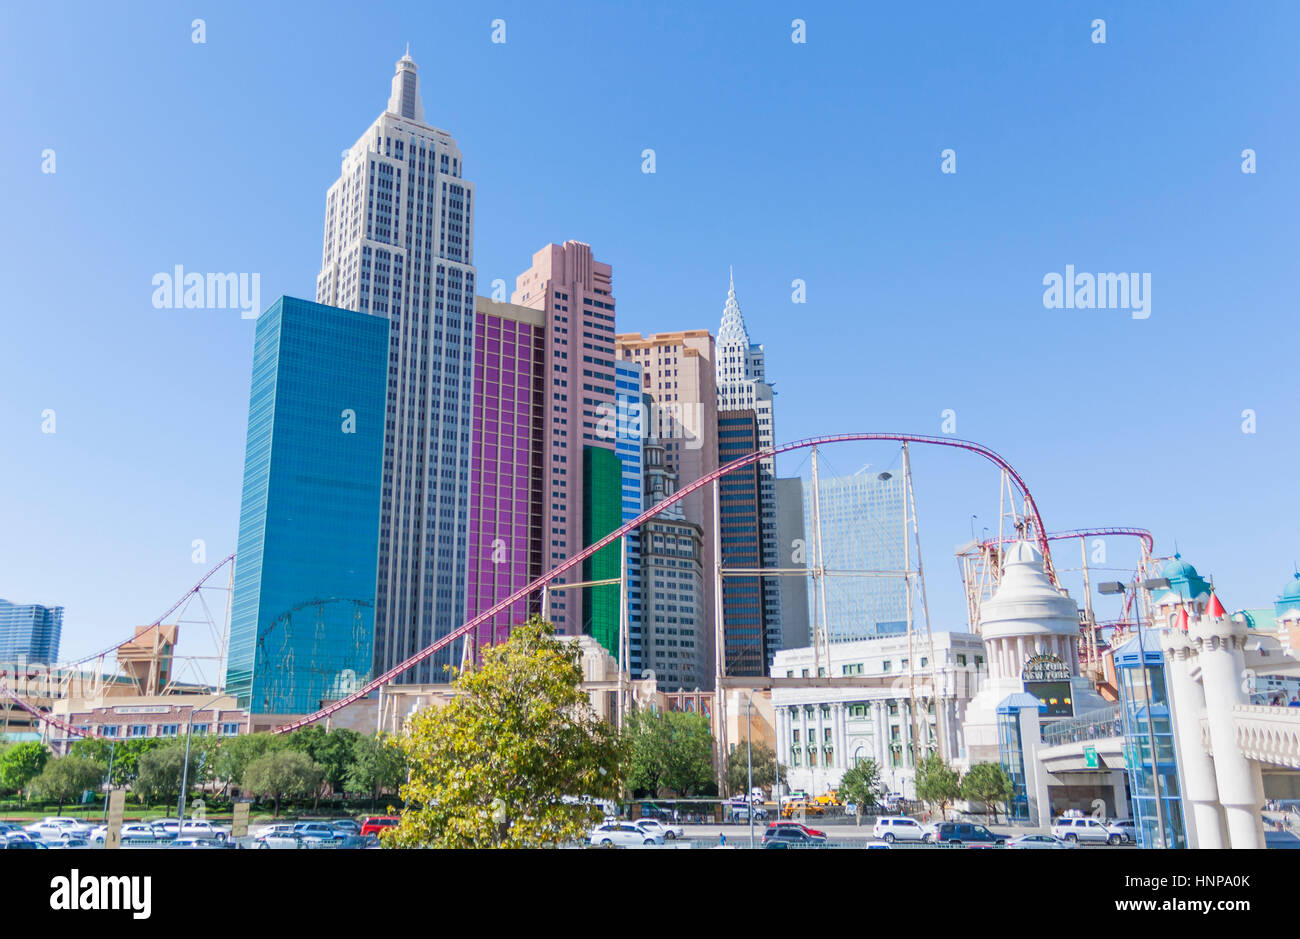 New York-New York Hotel avec roller coaster, le Strip, Las Vegas Boulevard South, Paradise, Las Vegas, Nevada, USA. Photo Stock